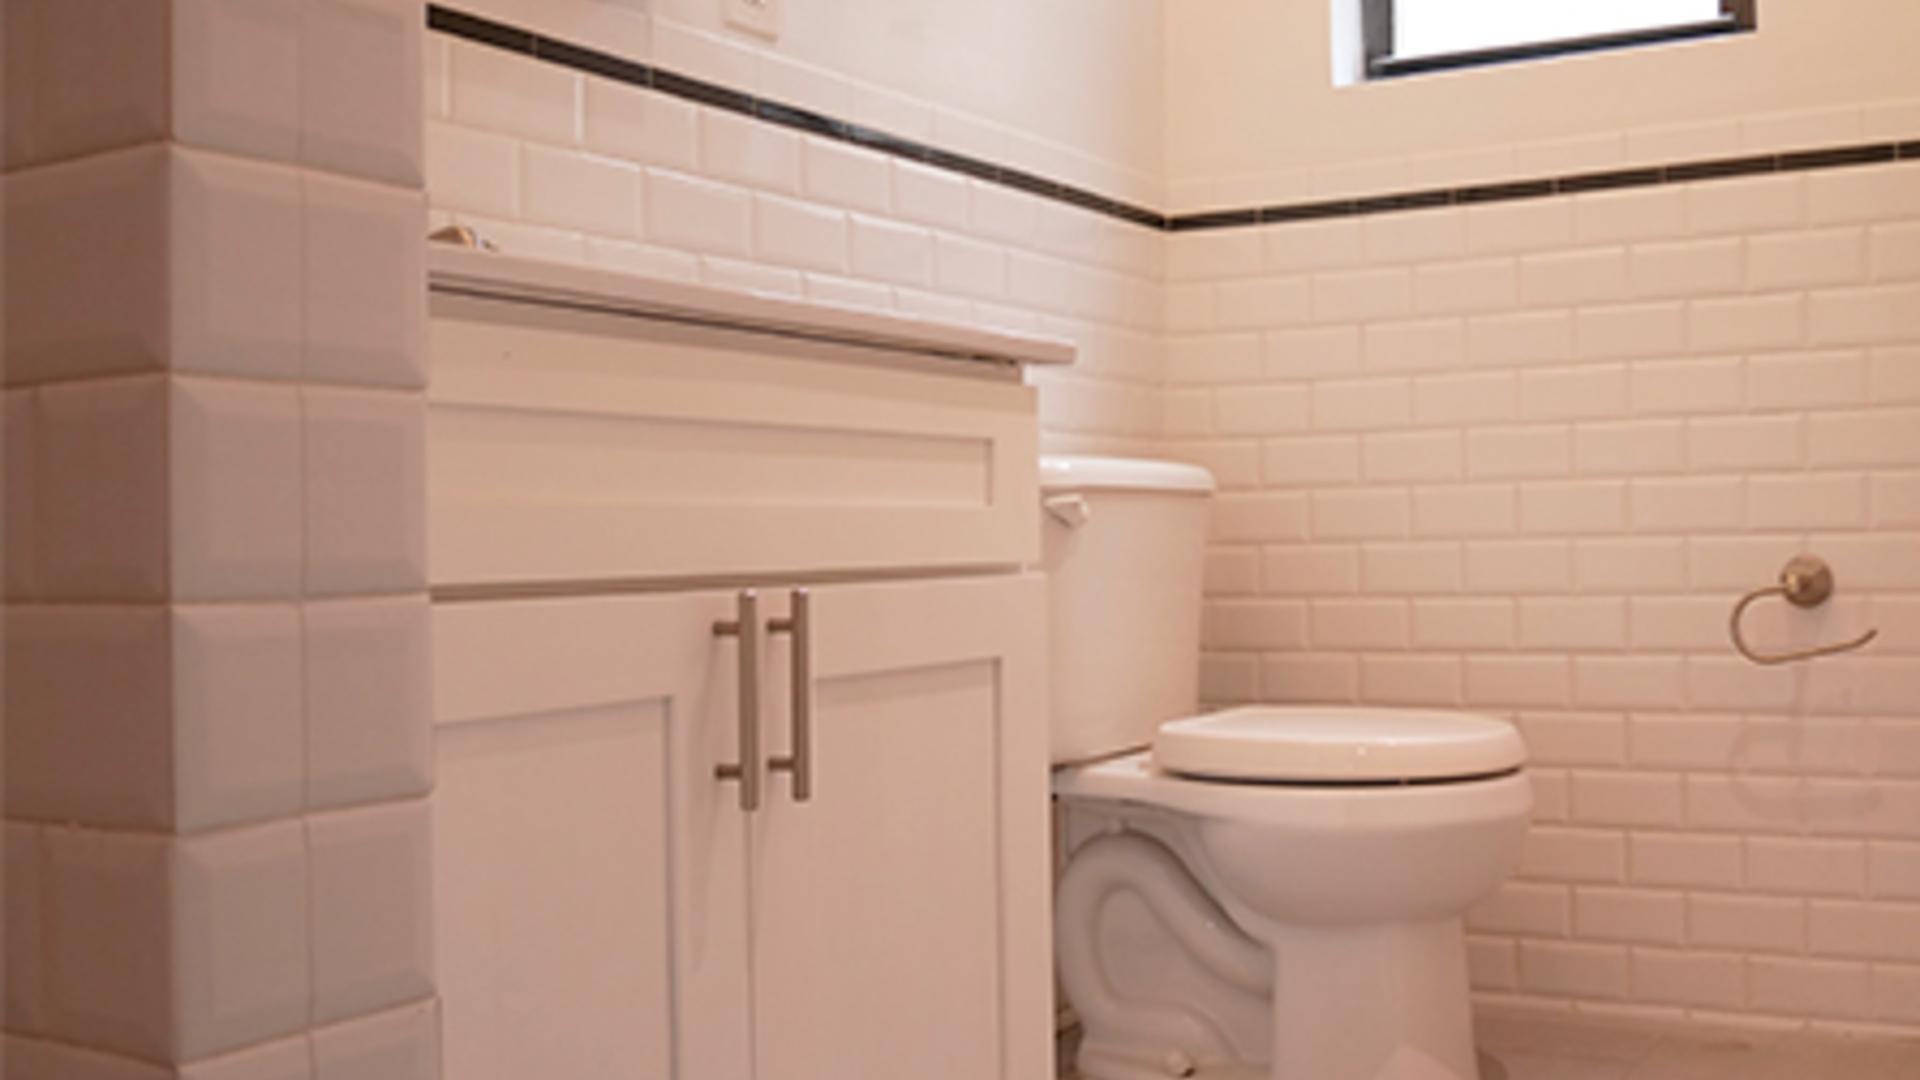 Def3baef 355 u38020 bathroom